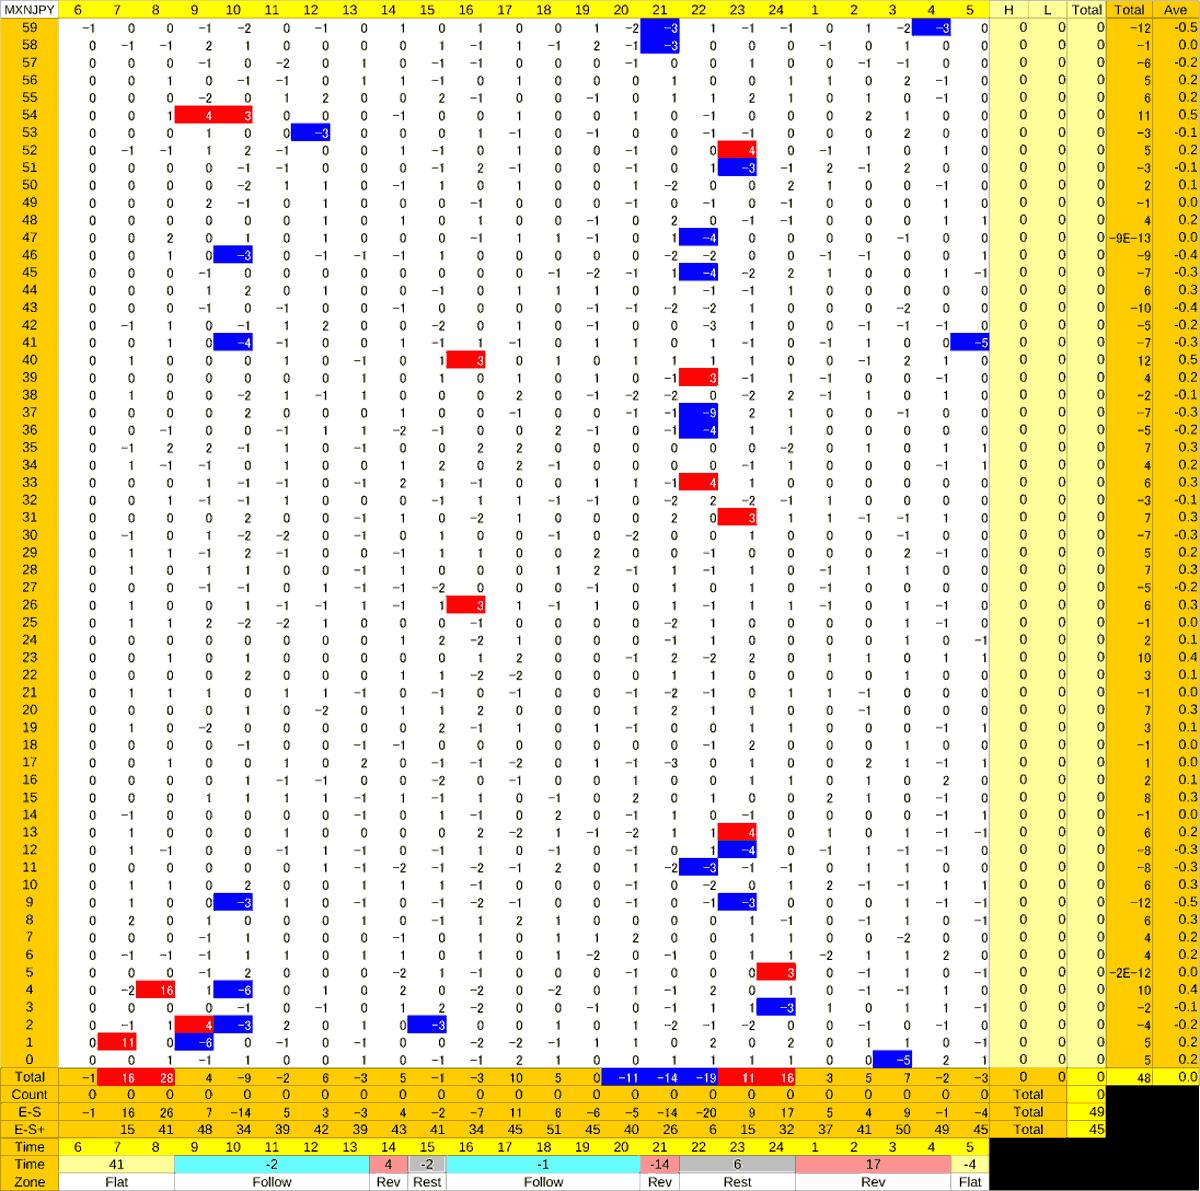 20200720_HS(3)MXNJPY